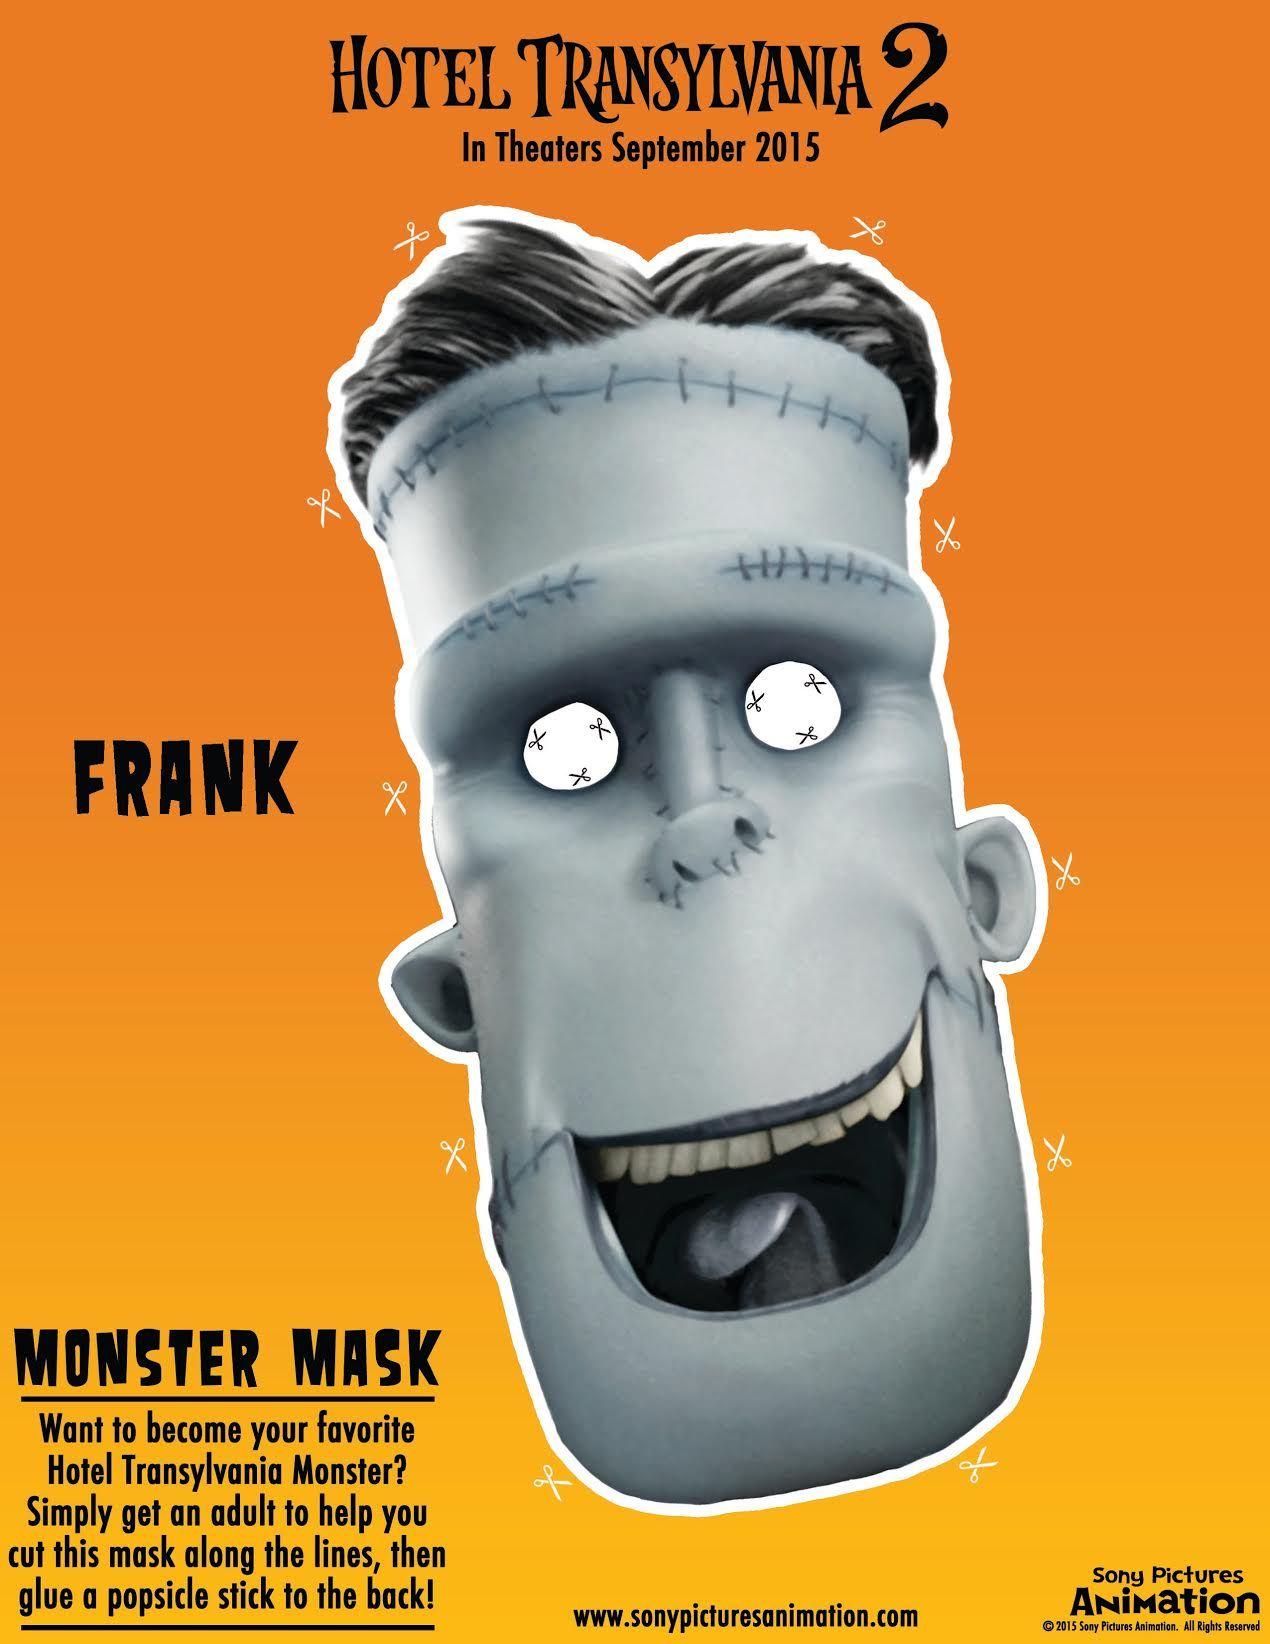 Hotel Transylvania 2 Frank Mask Jpg 1 270 1 644 Pixeles With